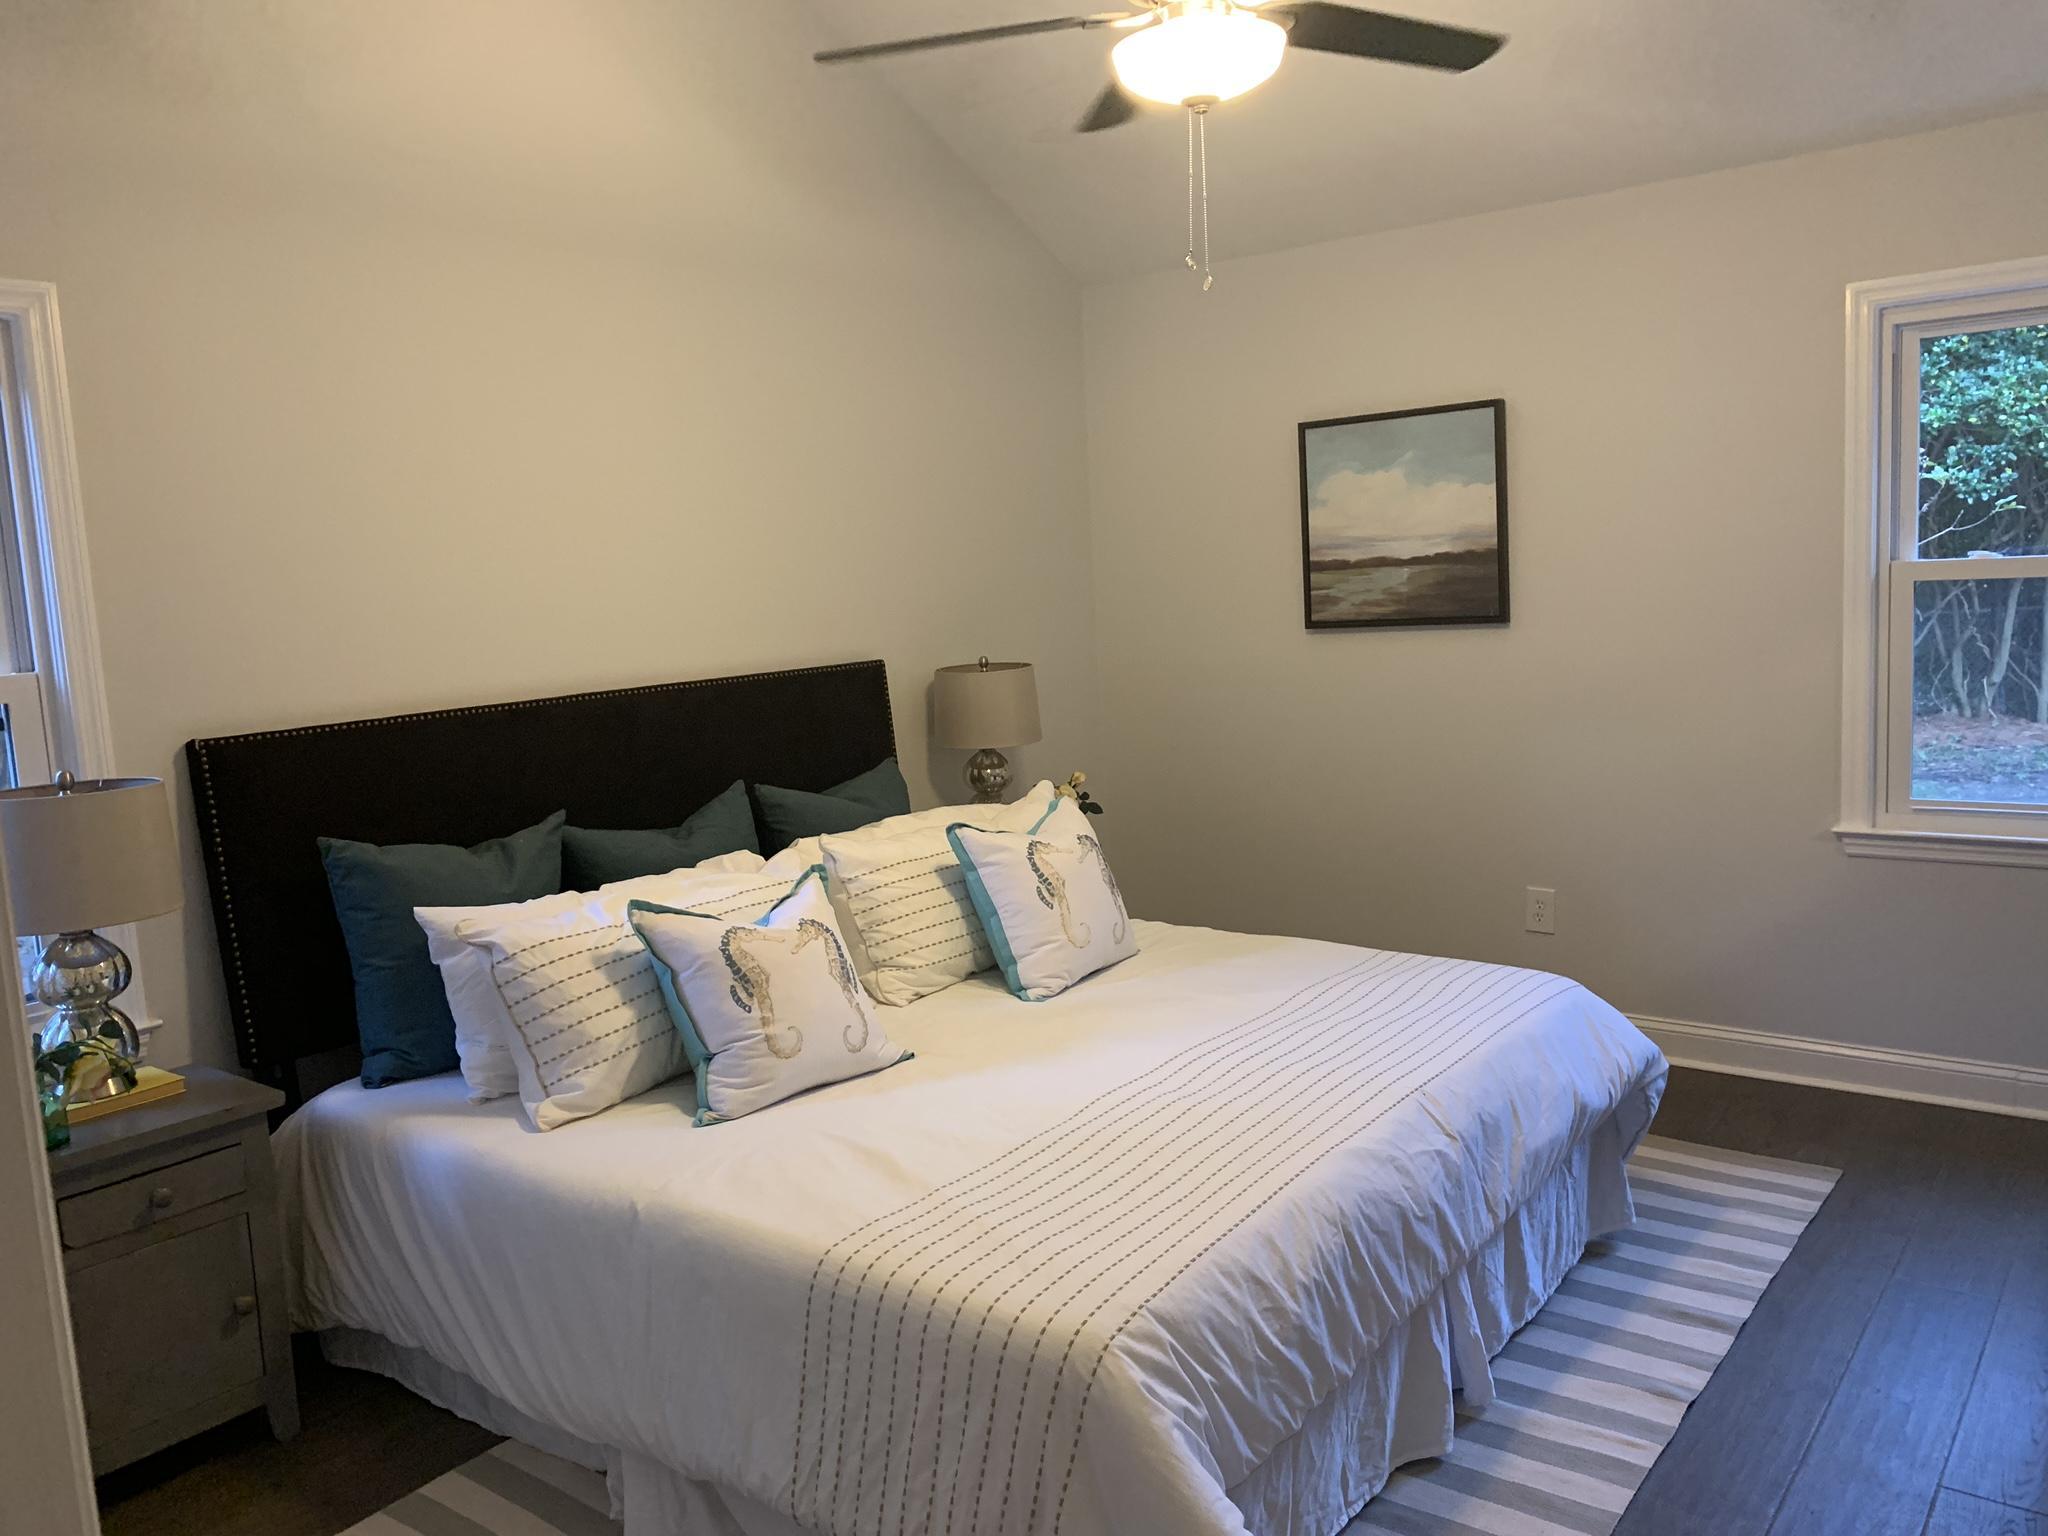 Heathwood Ext Homes For Sale - 2 Blaine, Charleston, SC - 13